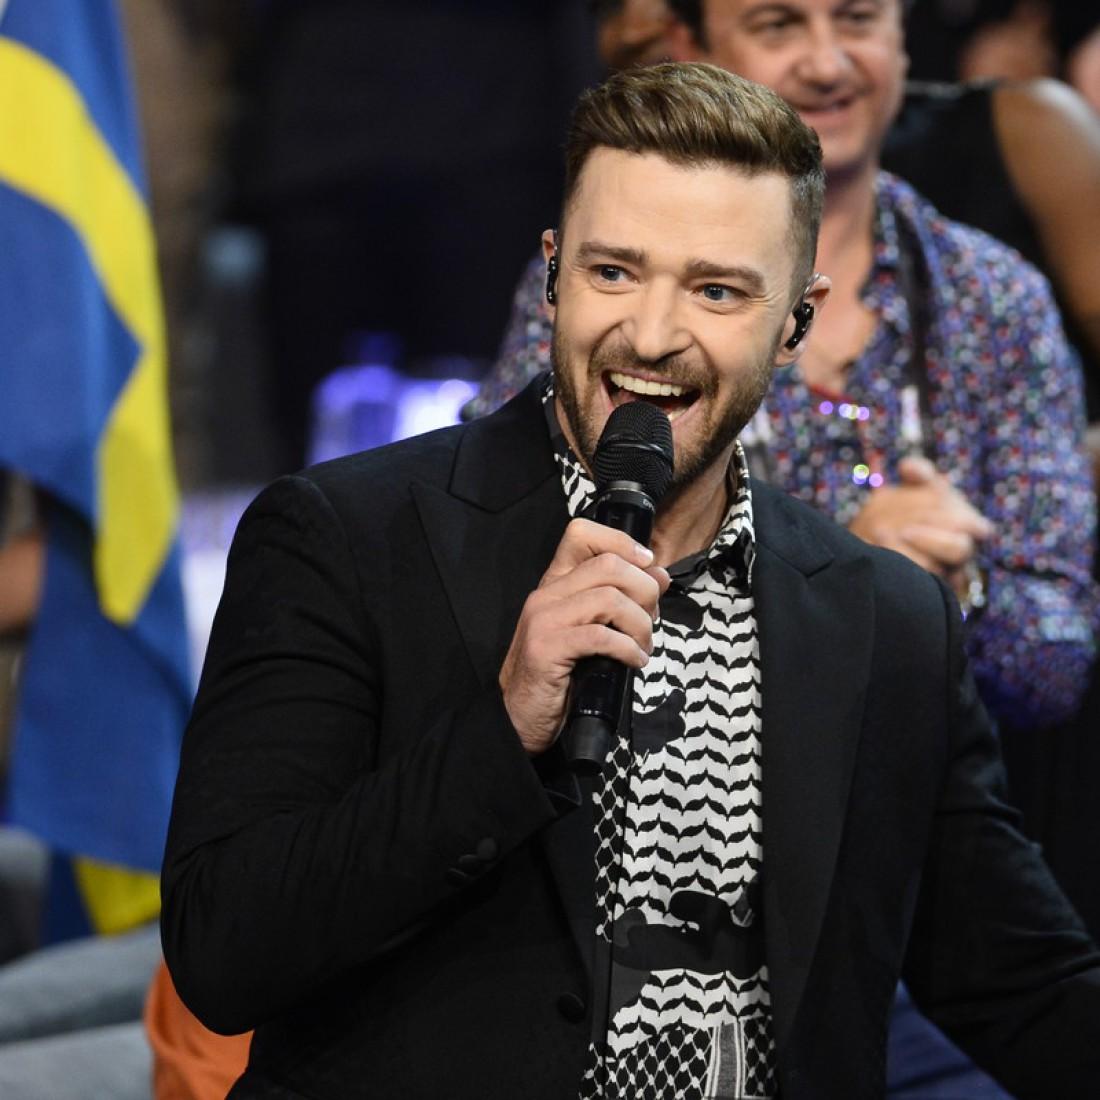 Финал Евровидения 2016: Джастин Тимберлейк